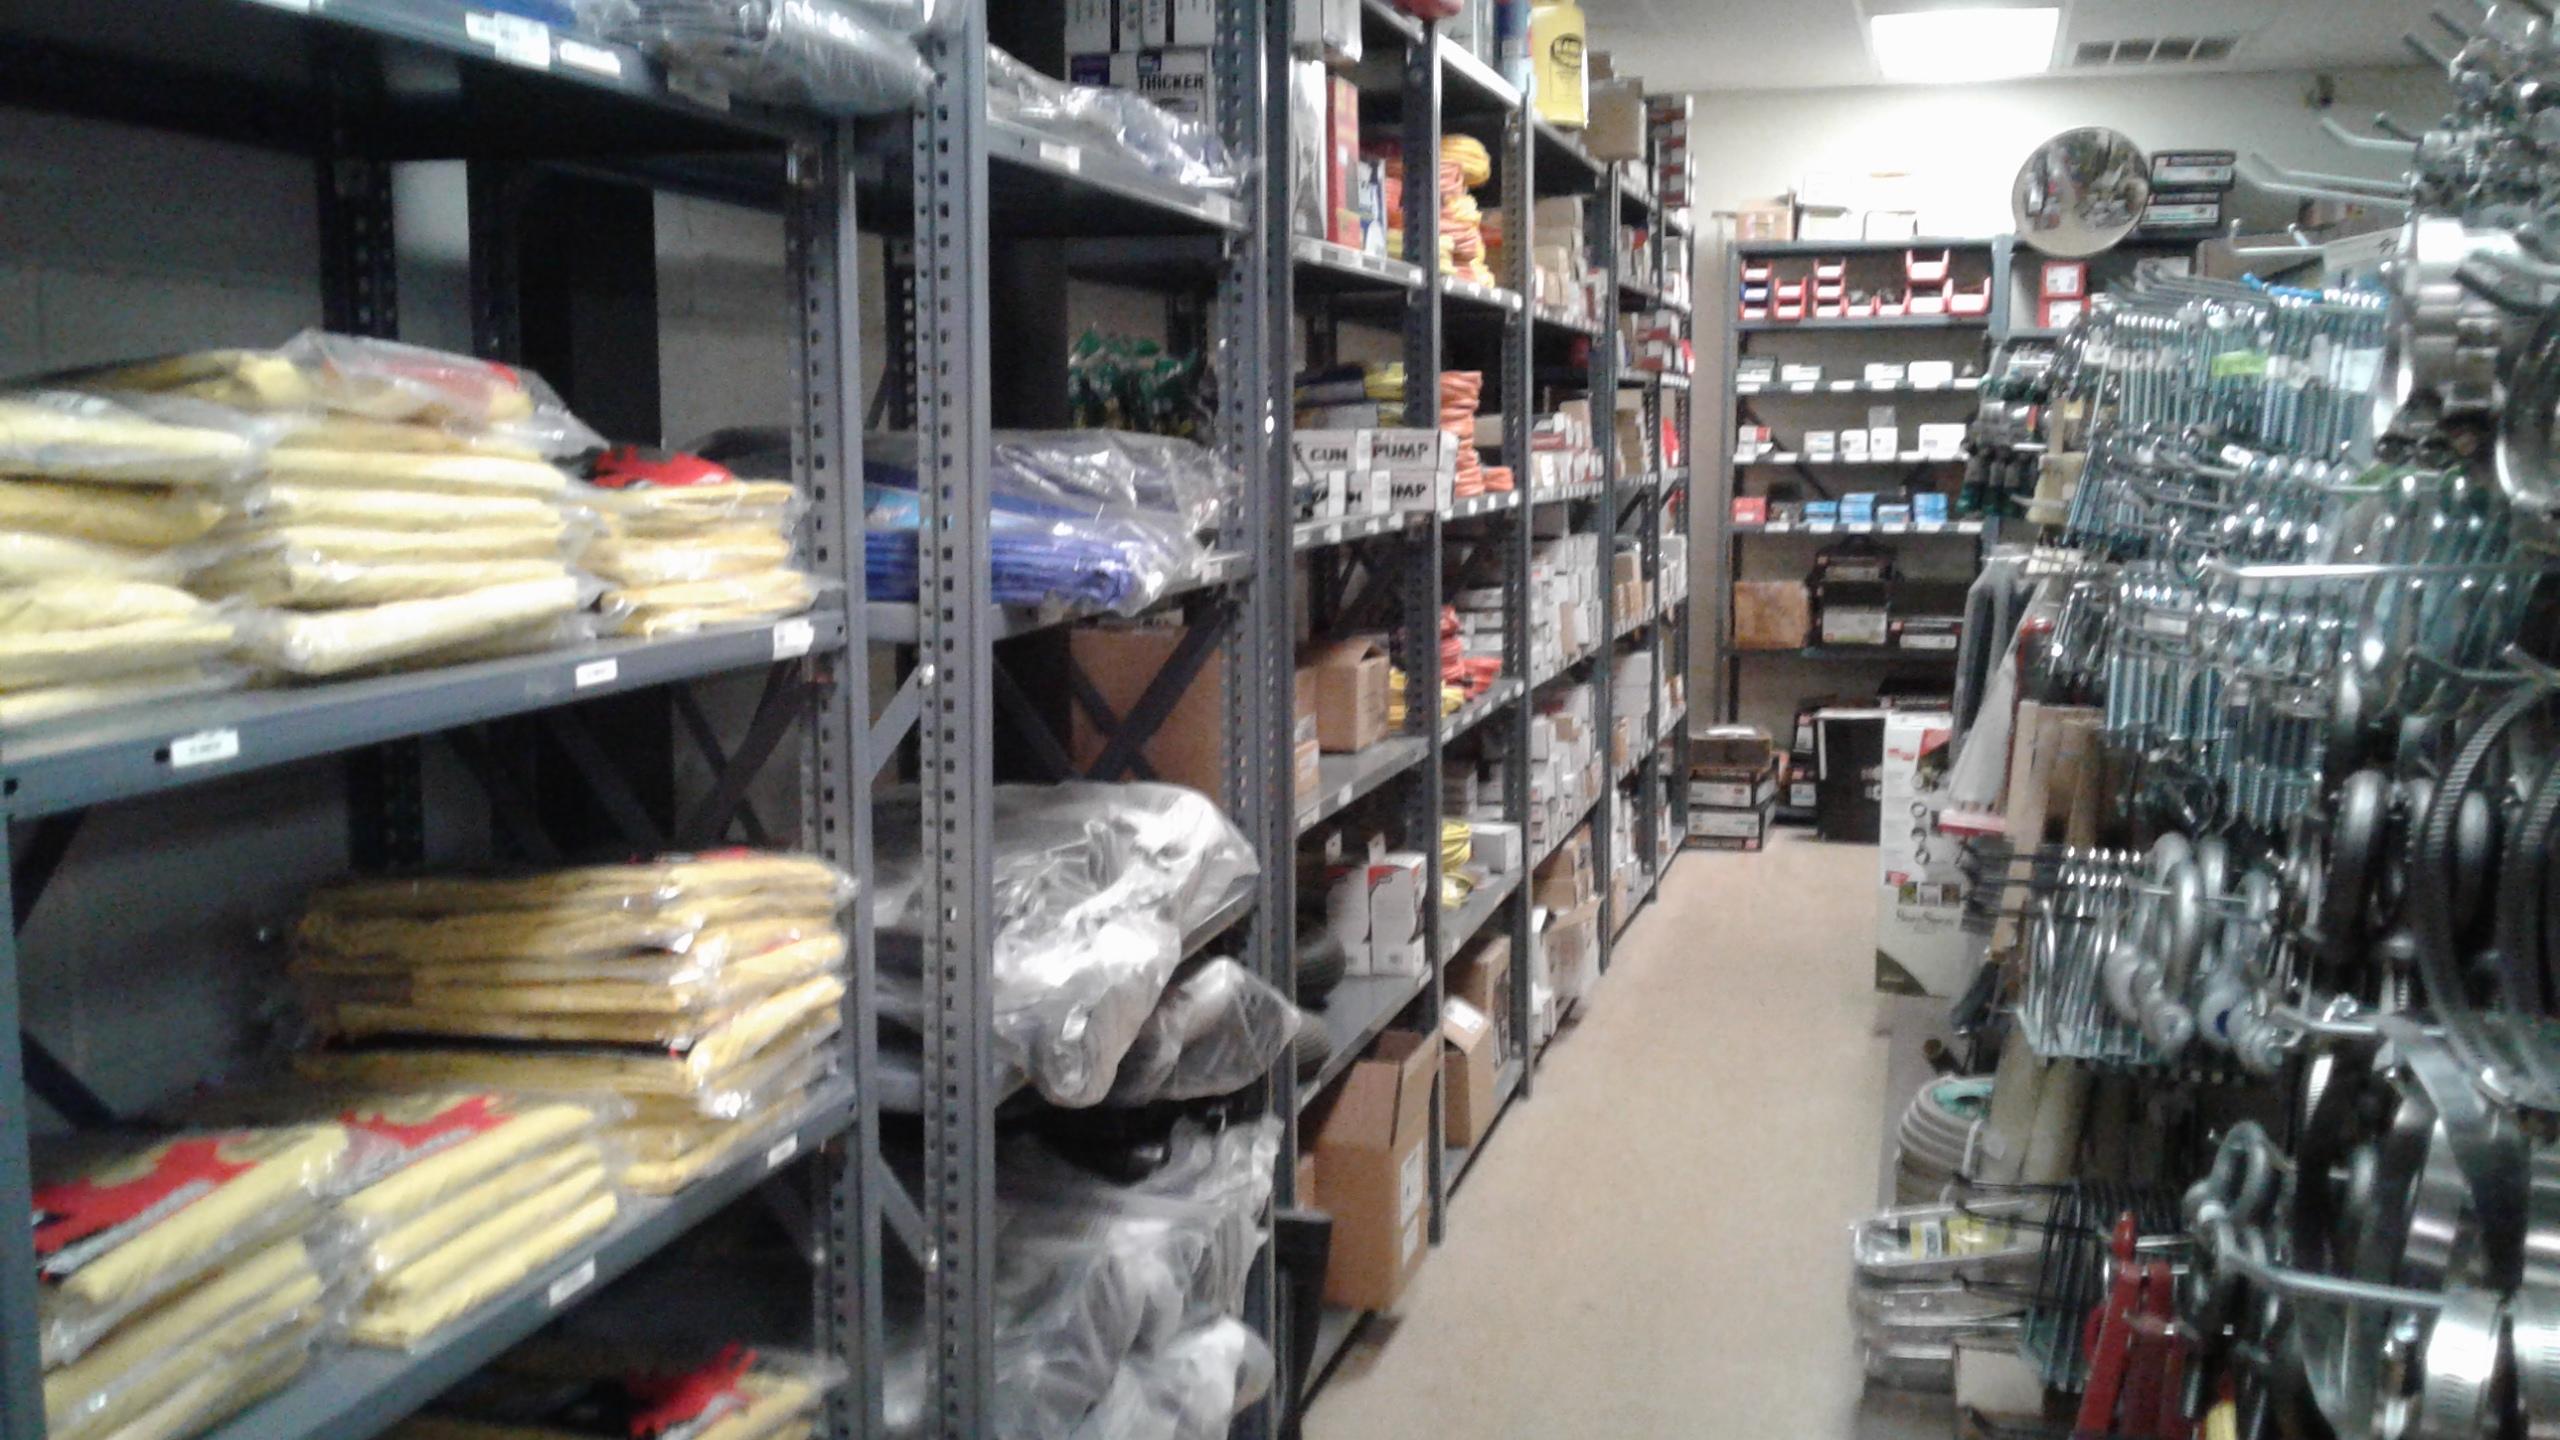 Comal Supply & Hardware Store image 5